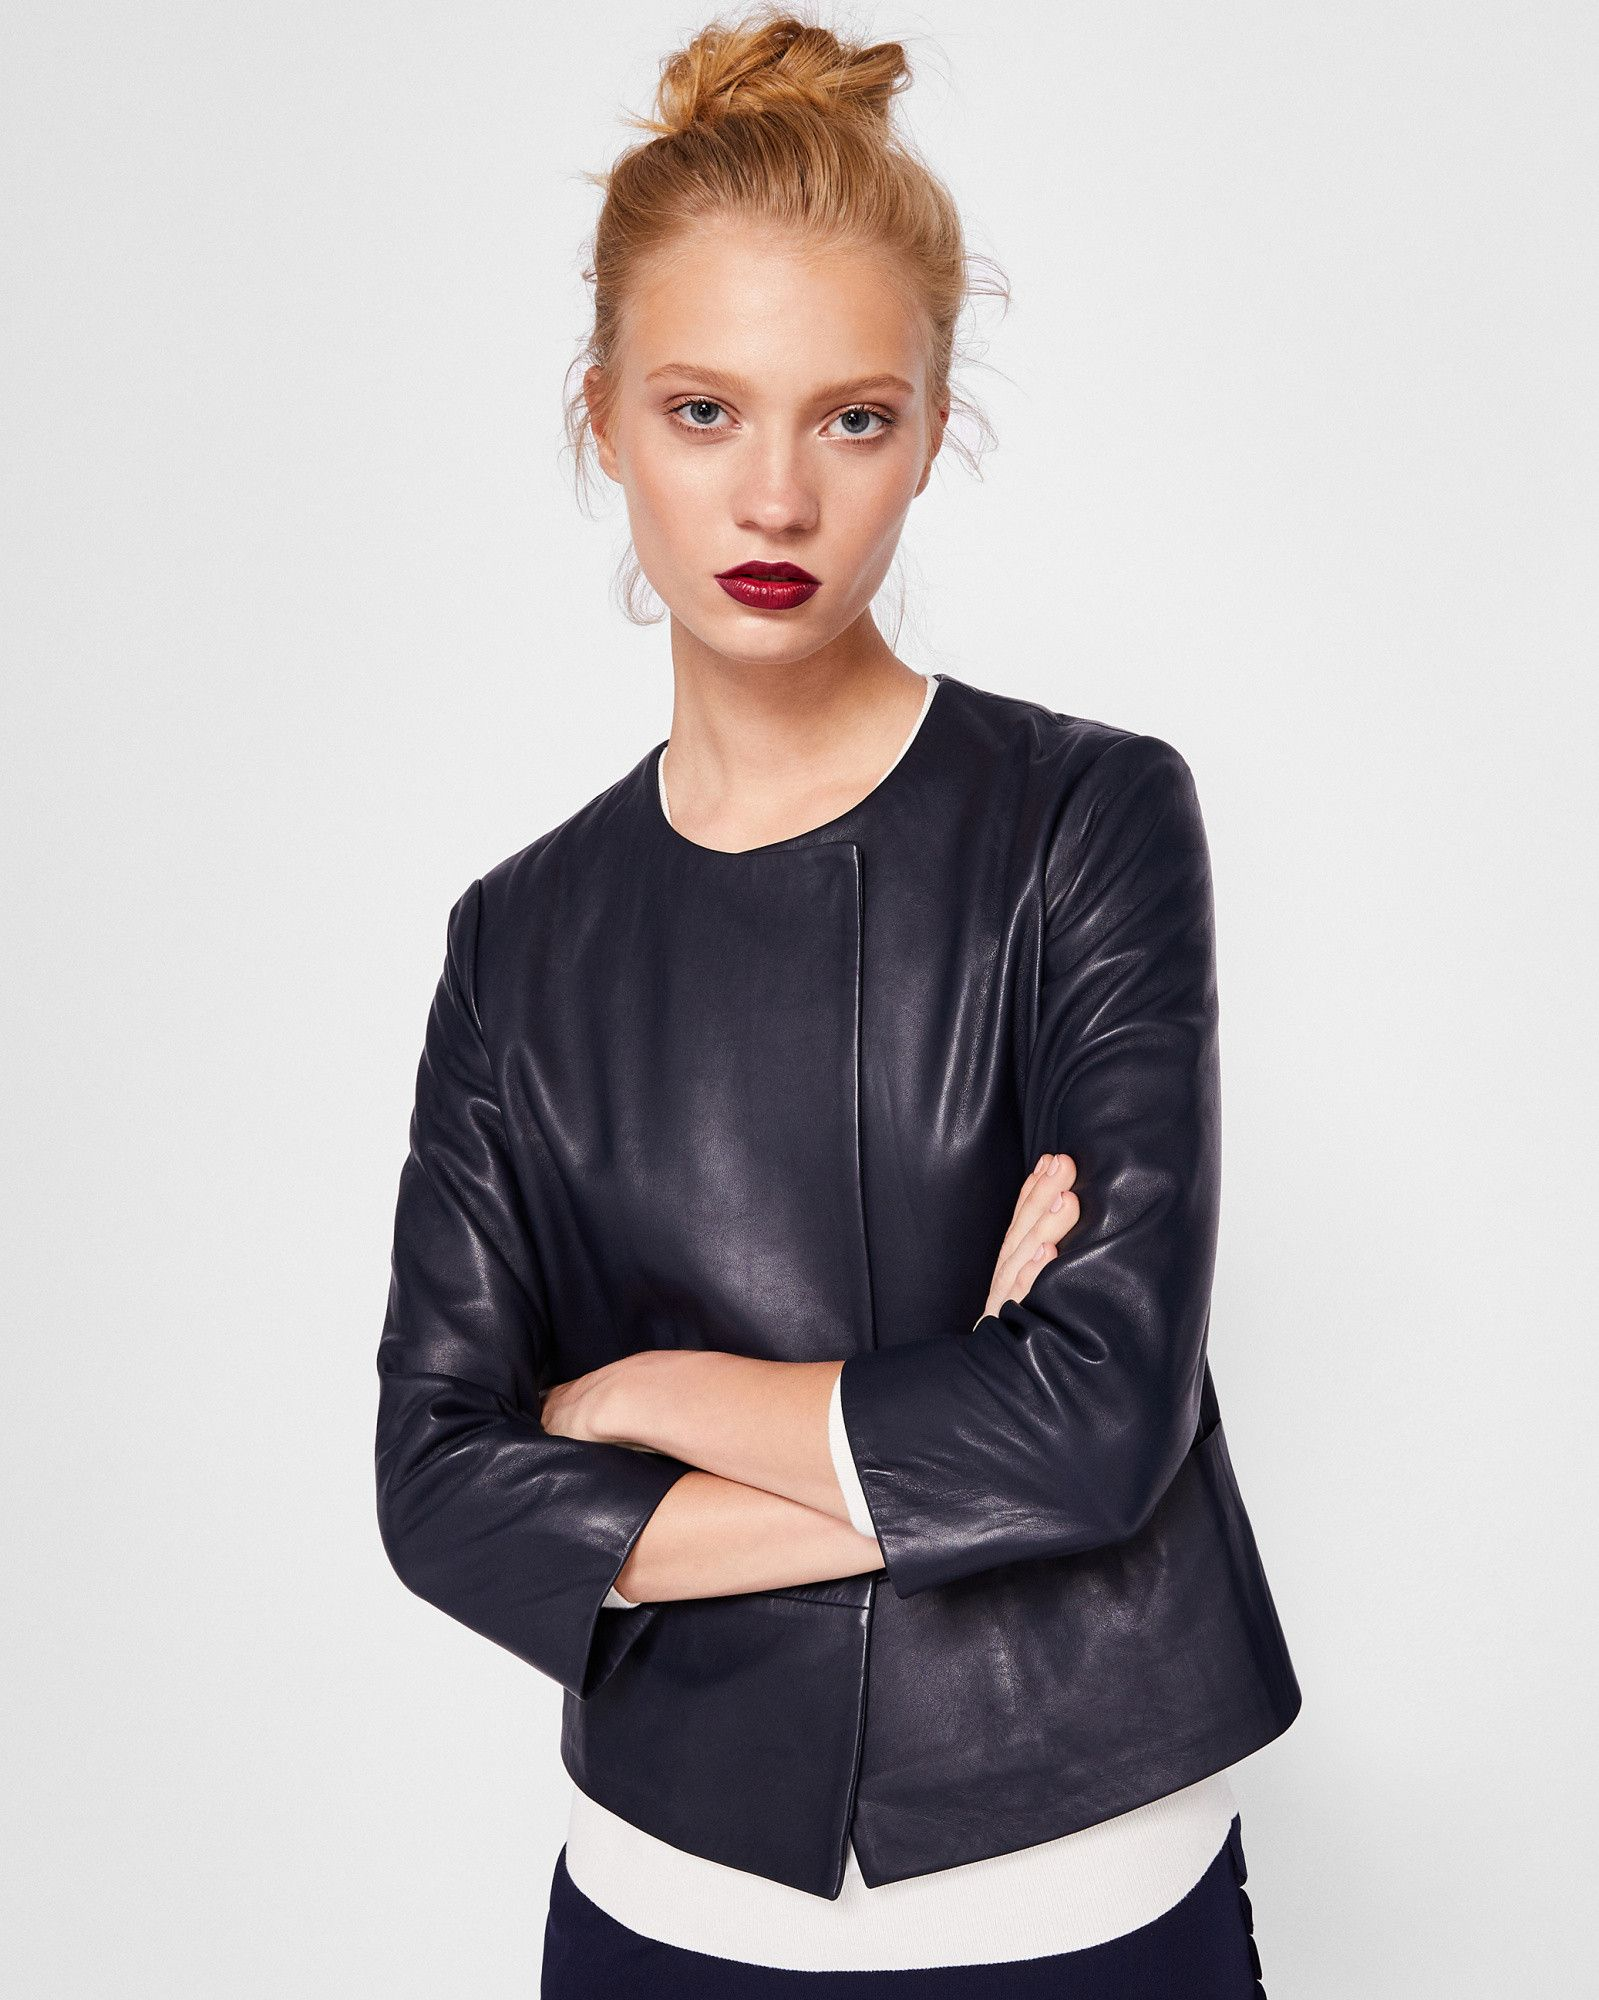 Rennay Leather Collarless Jacket Tedtotoe Collarless Leather Jacket Jackets Winter Coats Women [ 2000 x 1599 Pixel ]